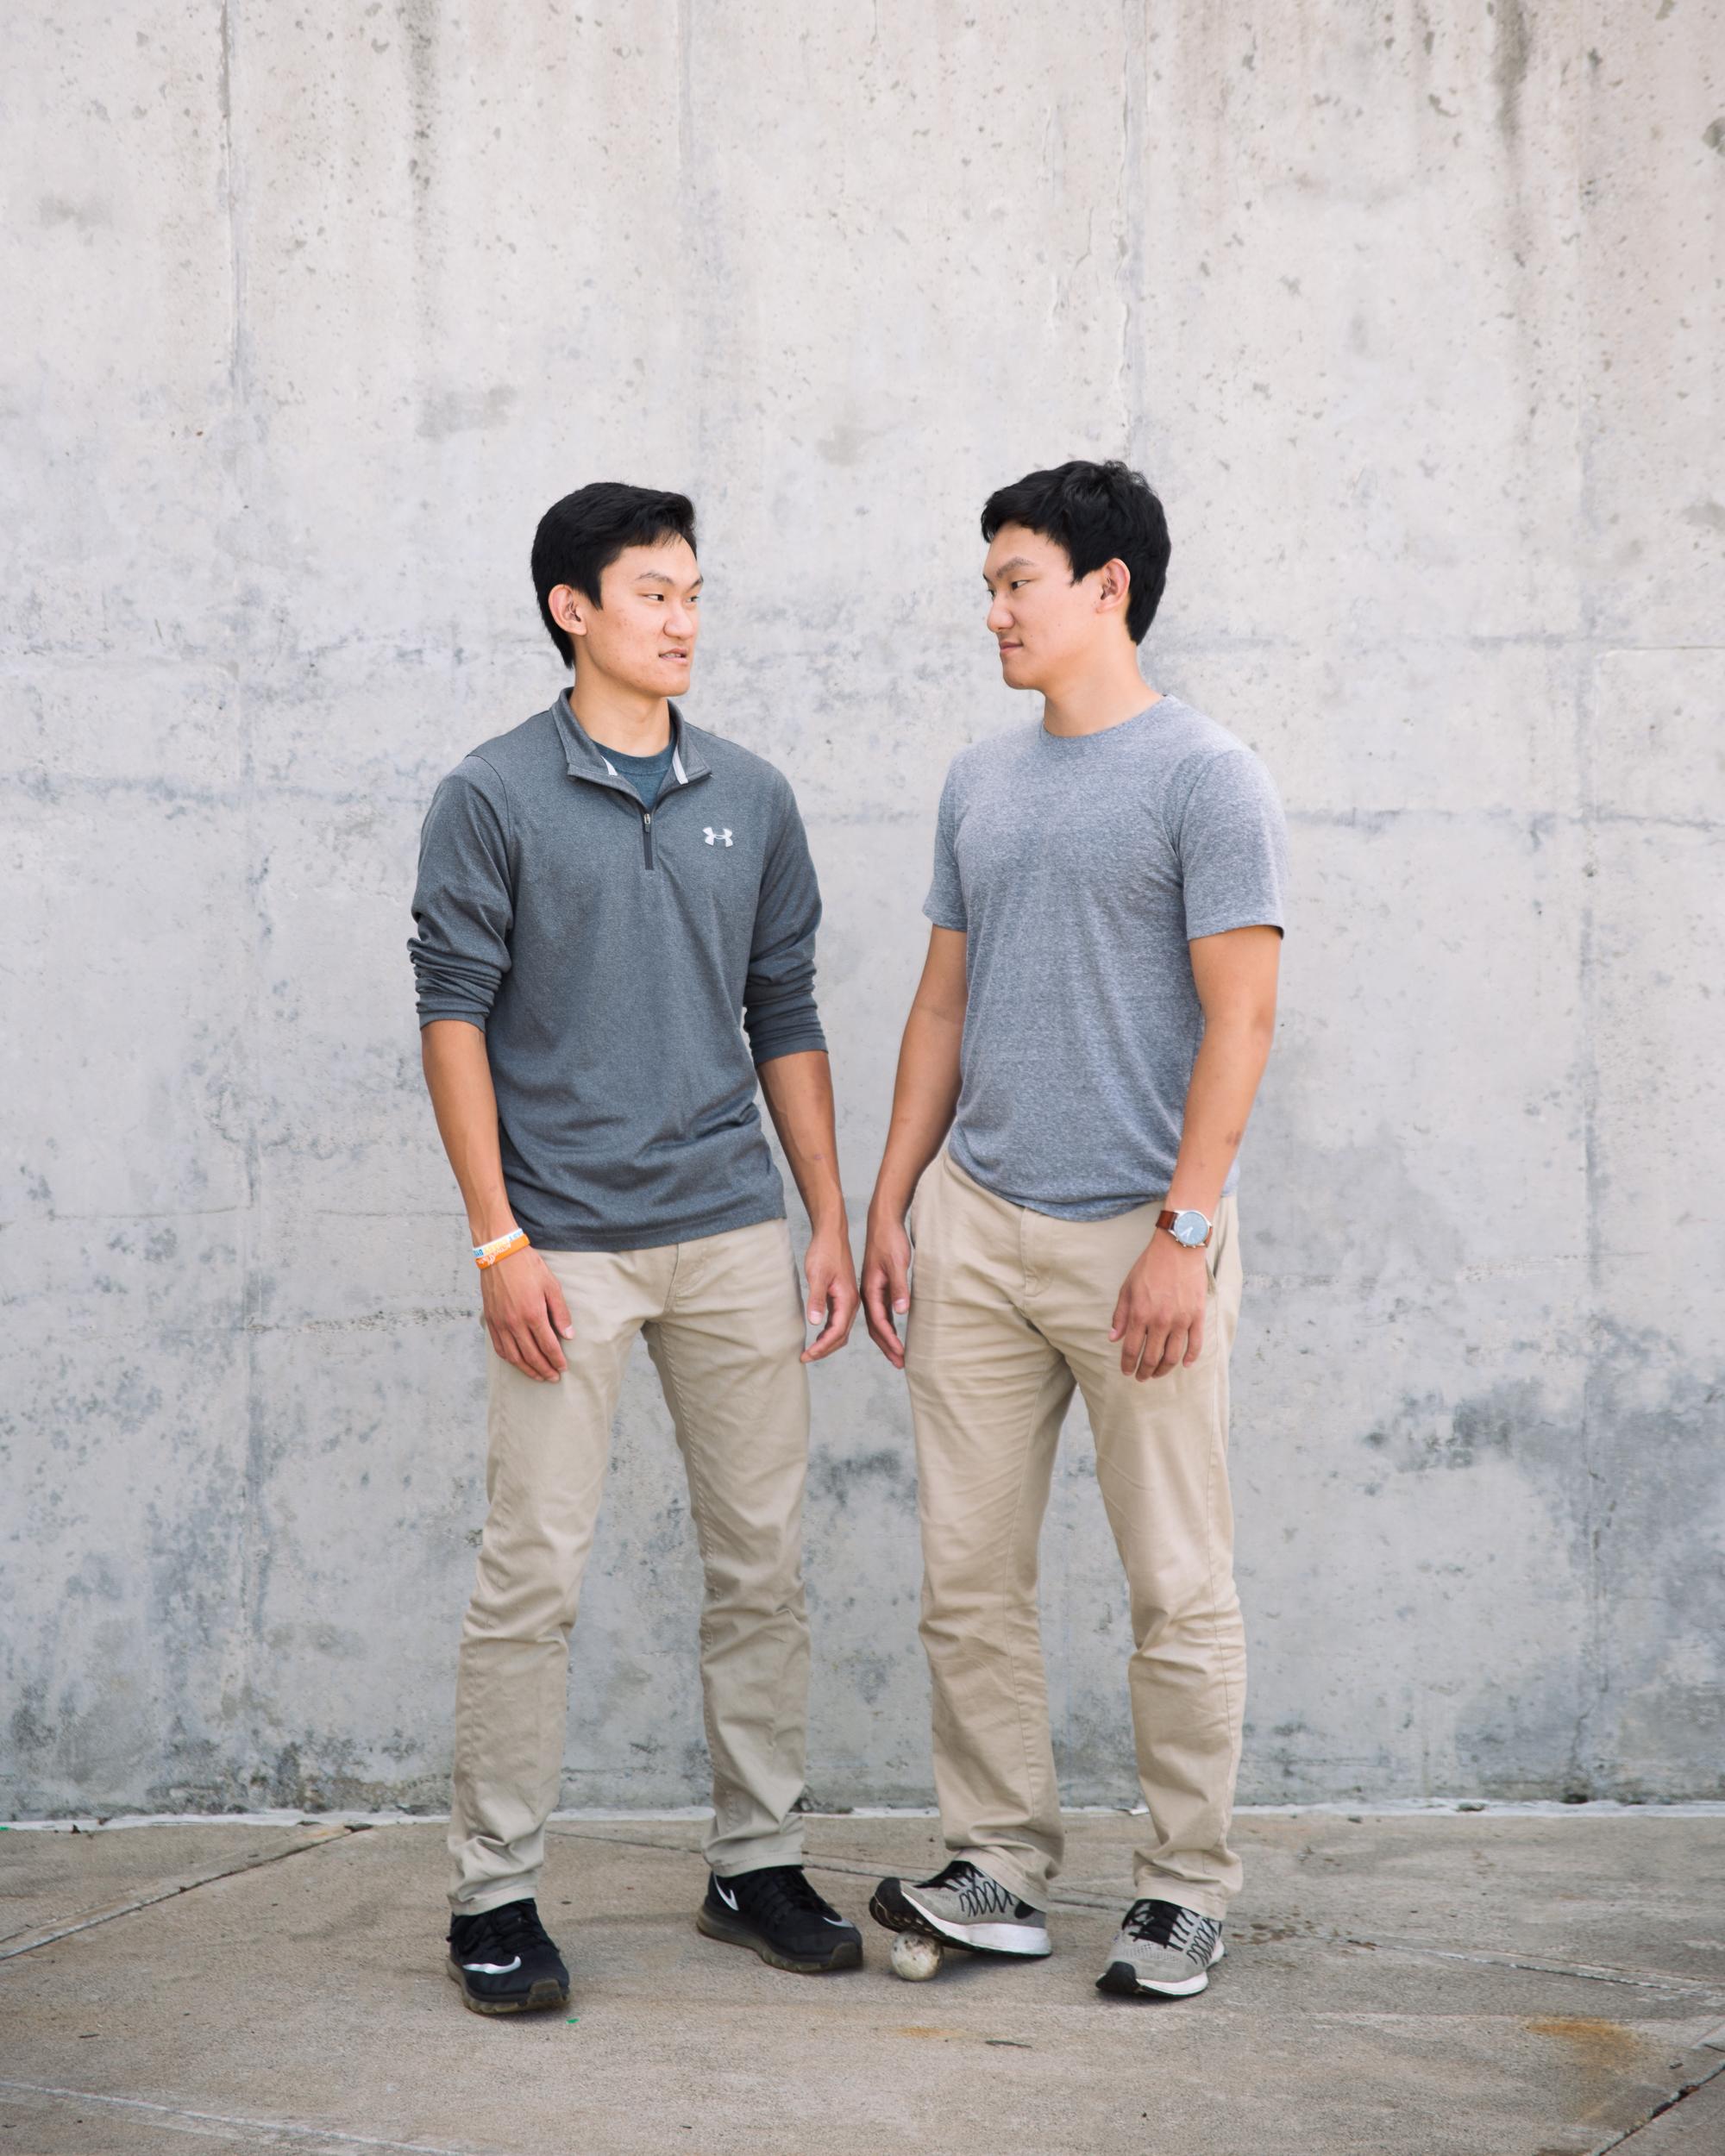 Campbell_twins_003.jpg